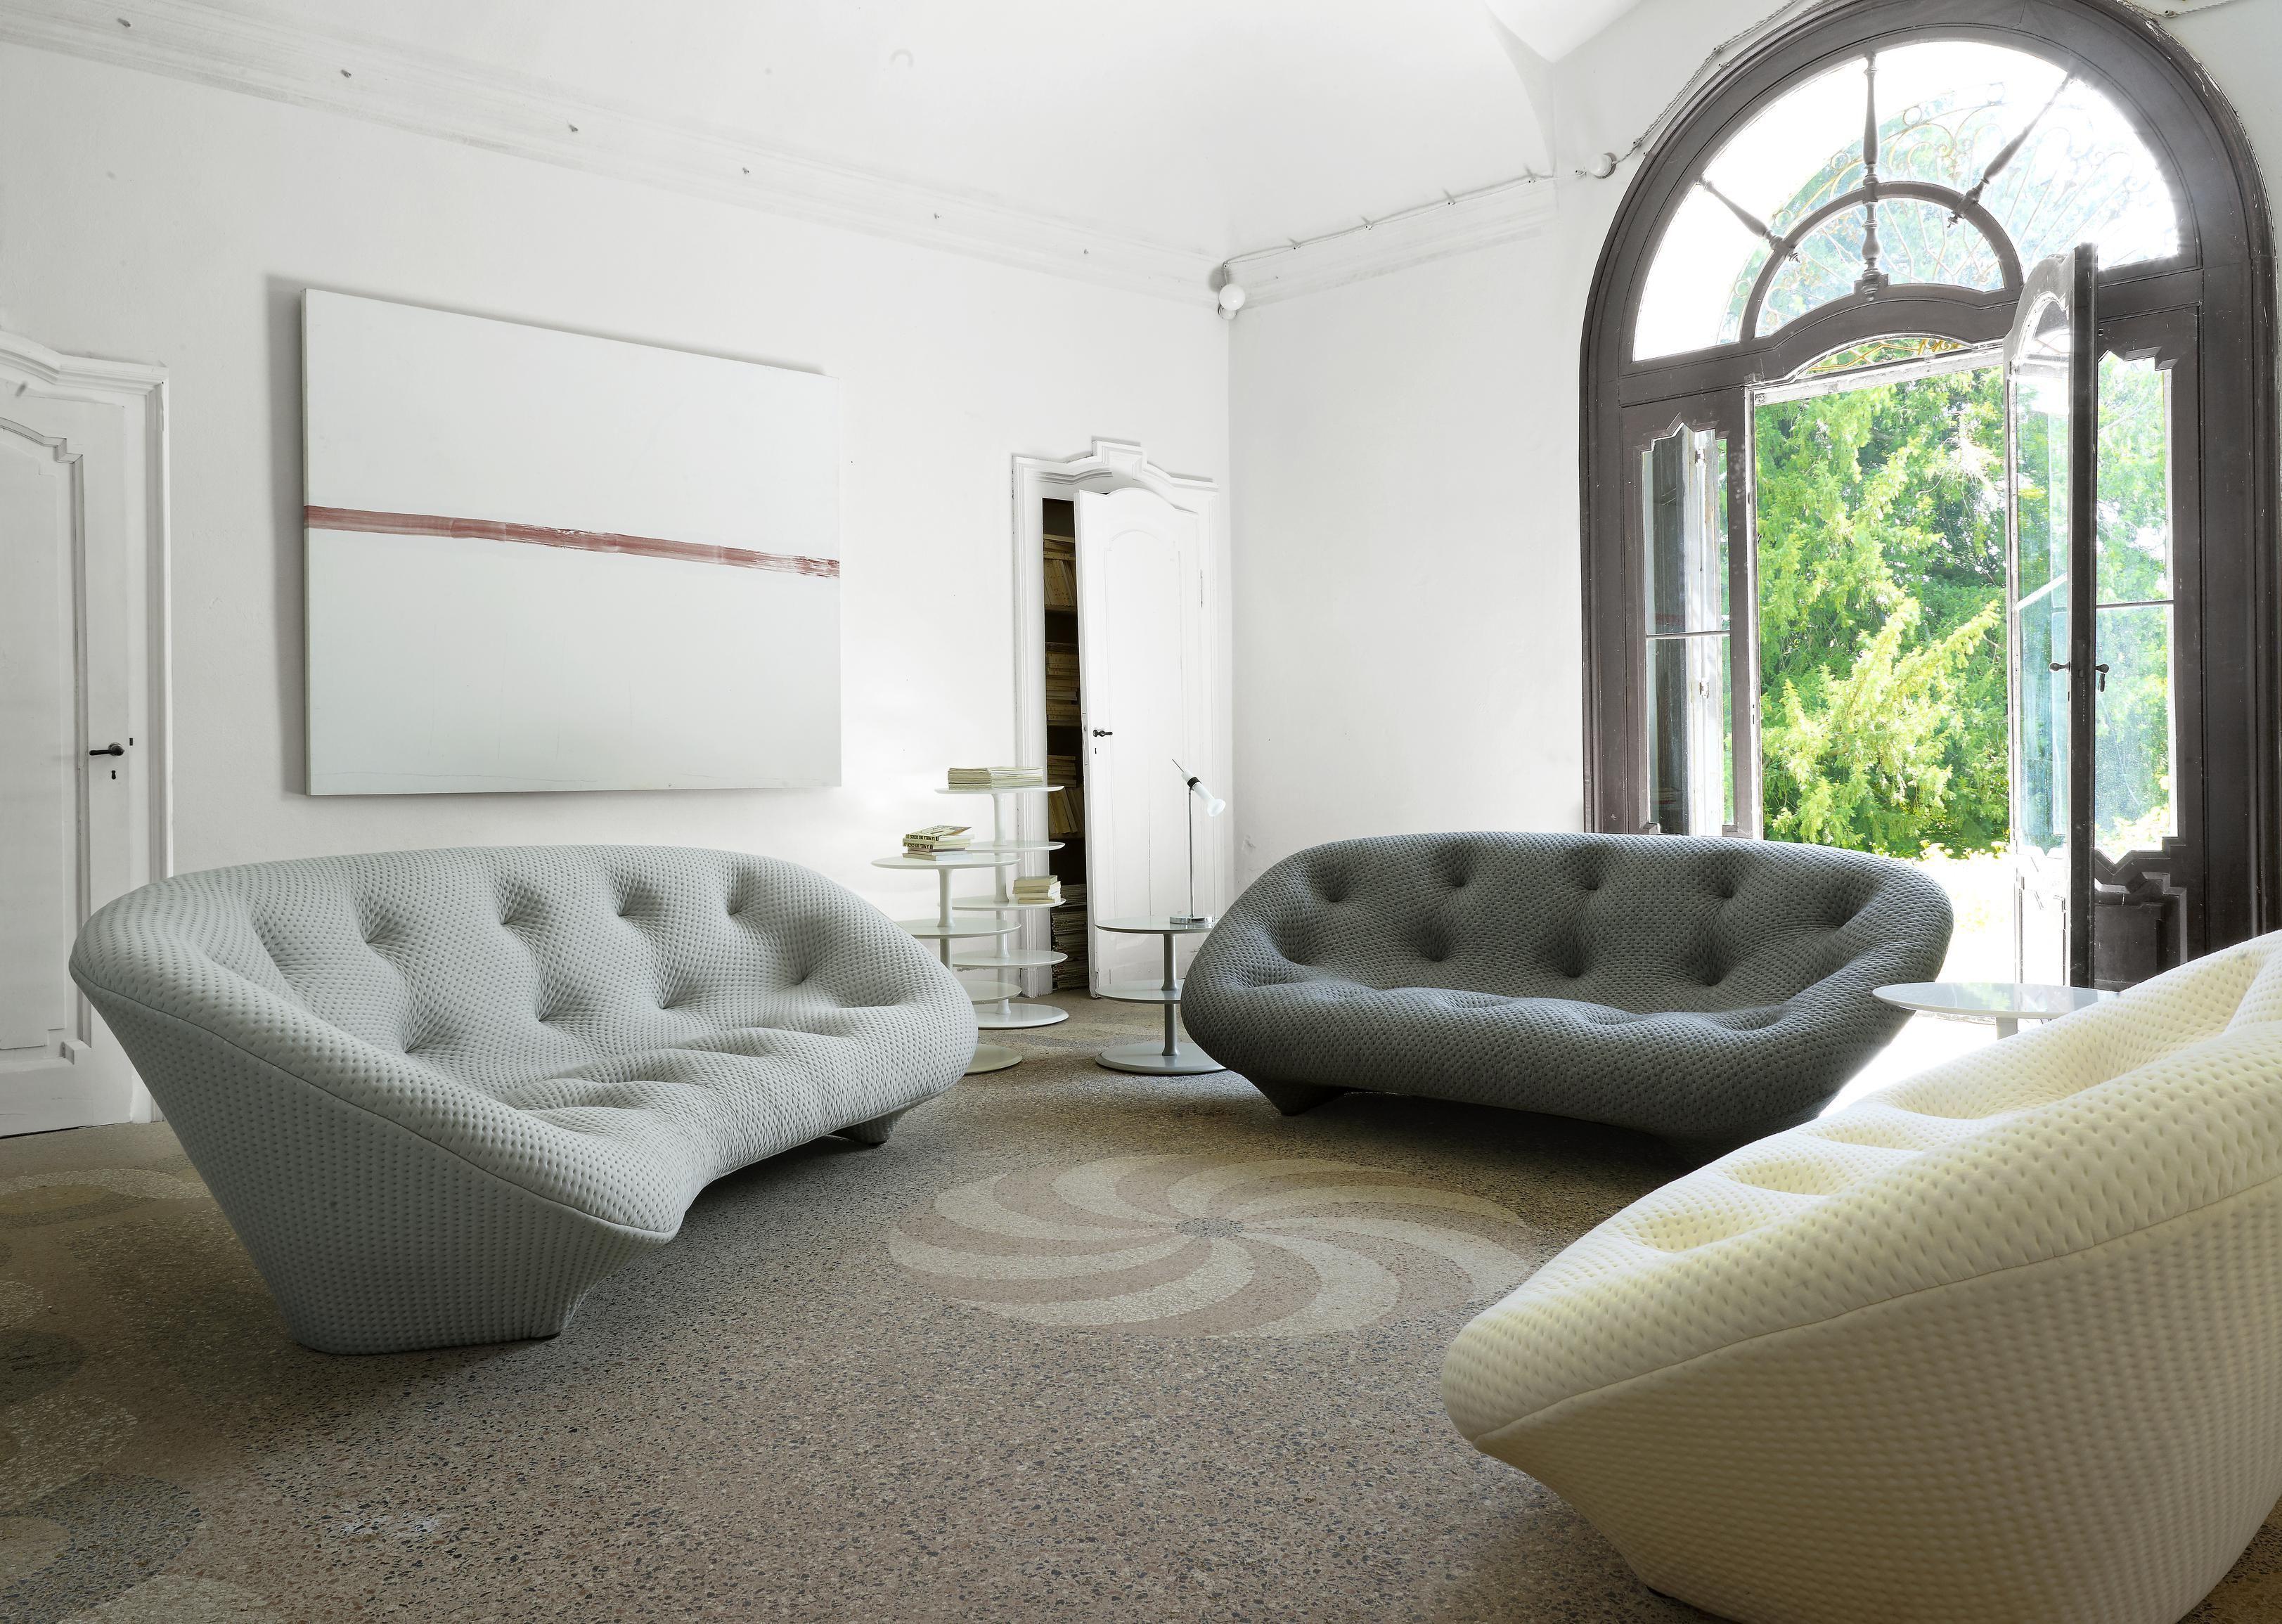 14 Magnificent Upholstery Sofa Decor Ideas Ligne Roset Sofa